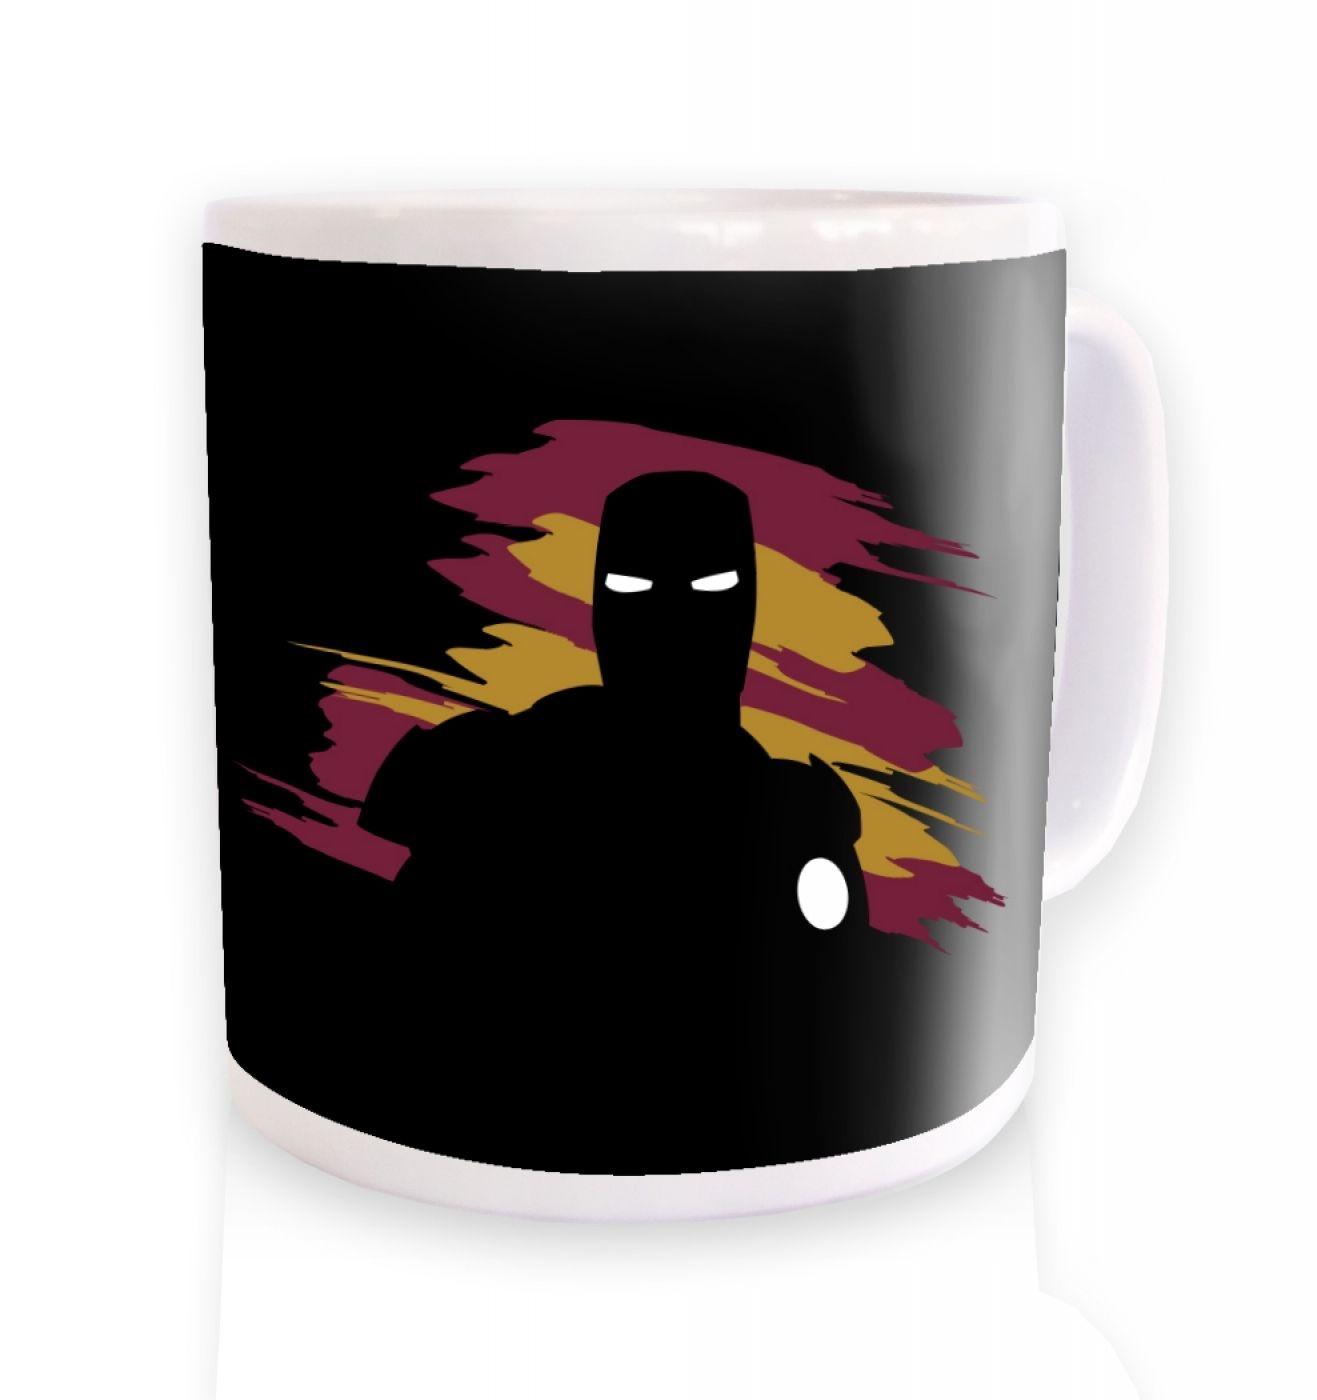 iMan silhouette inspired by Iron Man & The Avengers Mens Mug